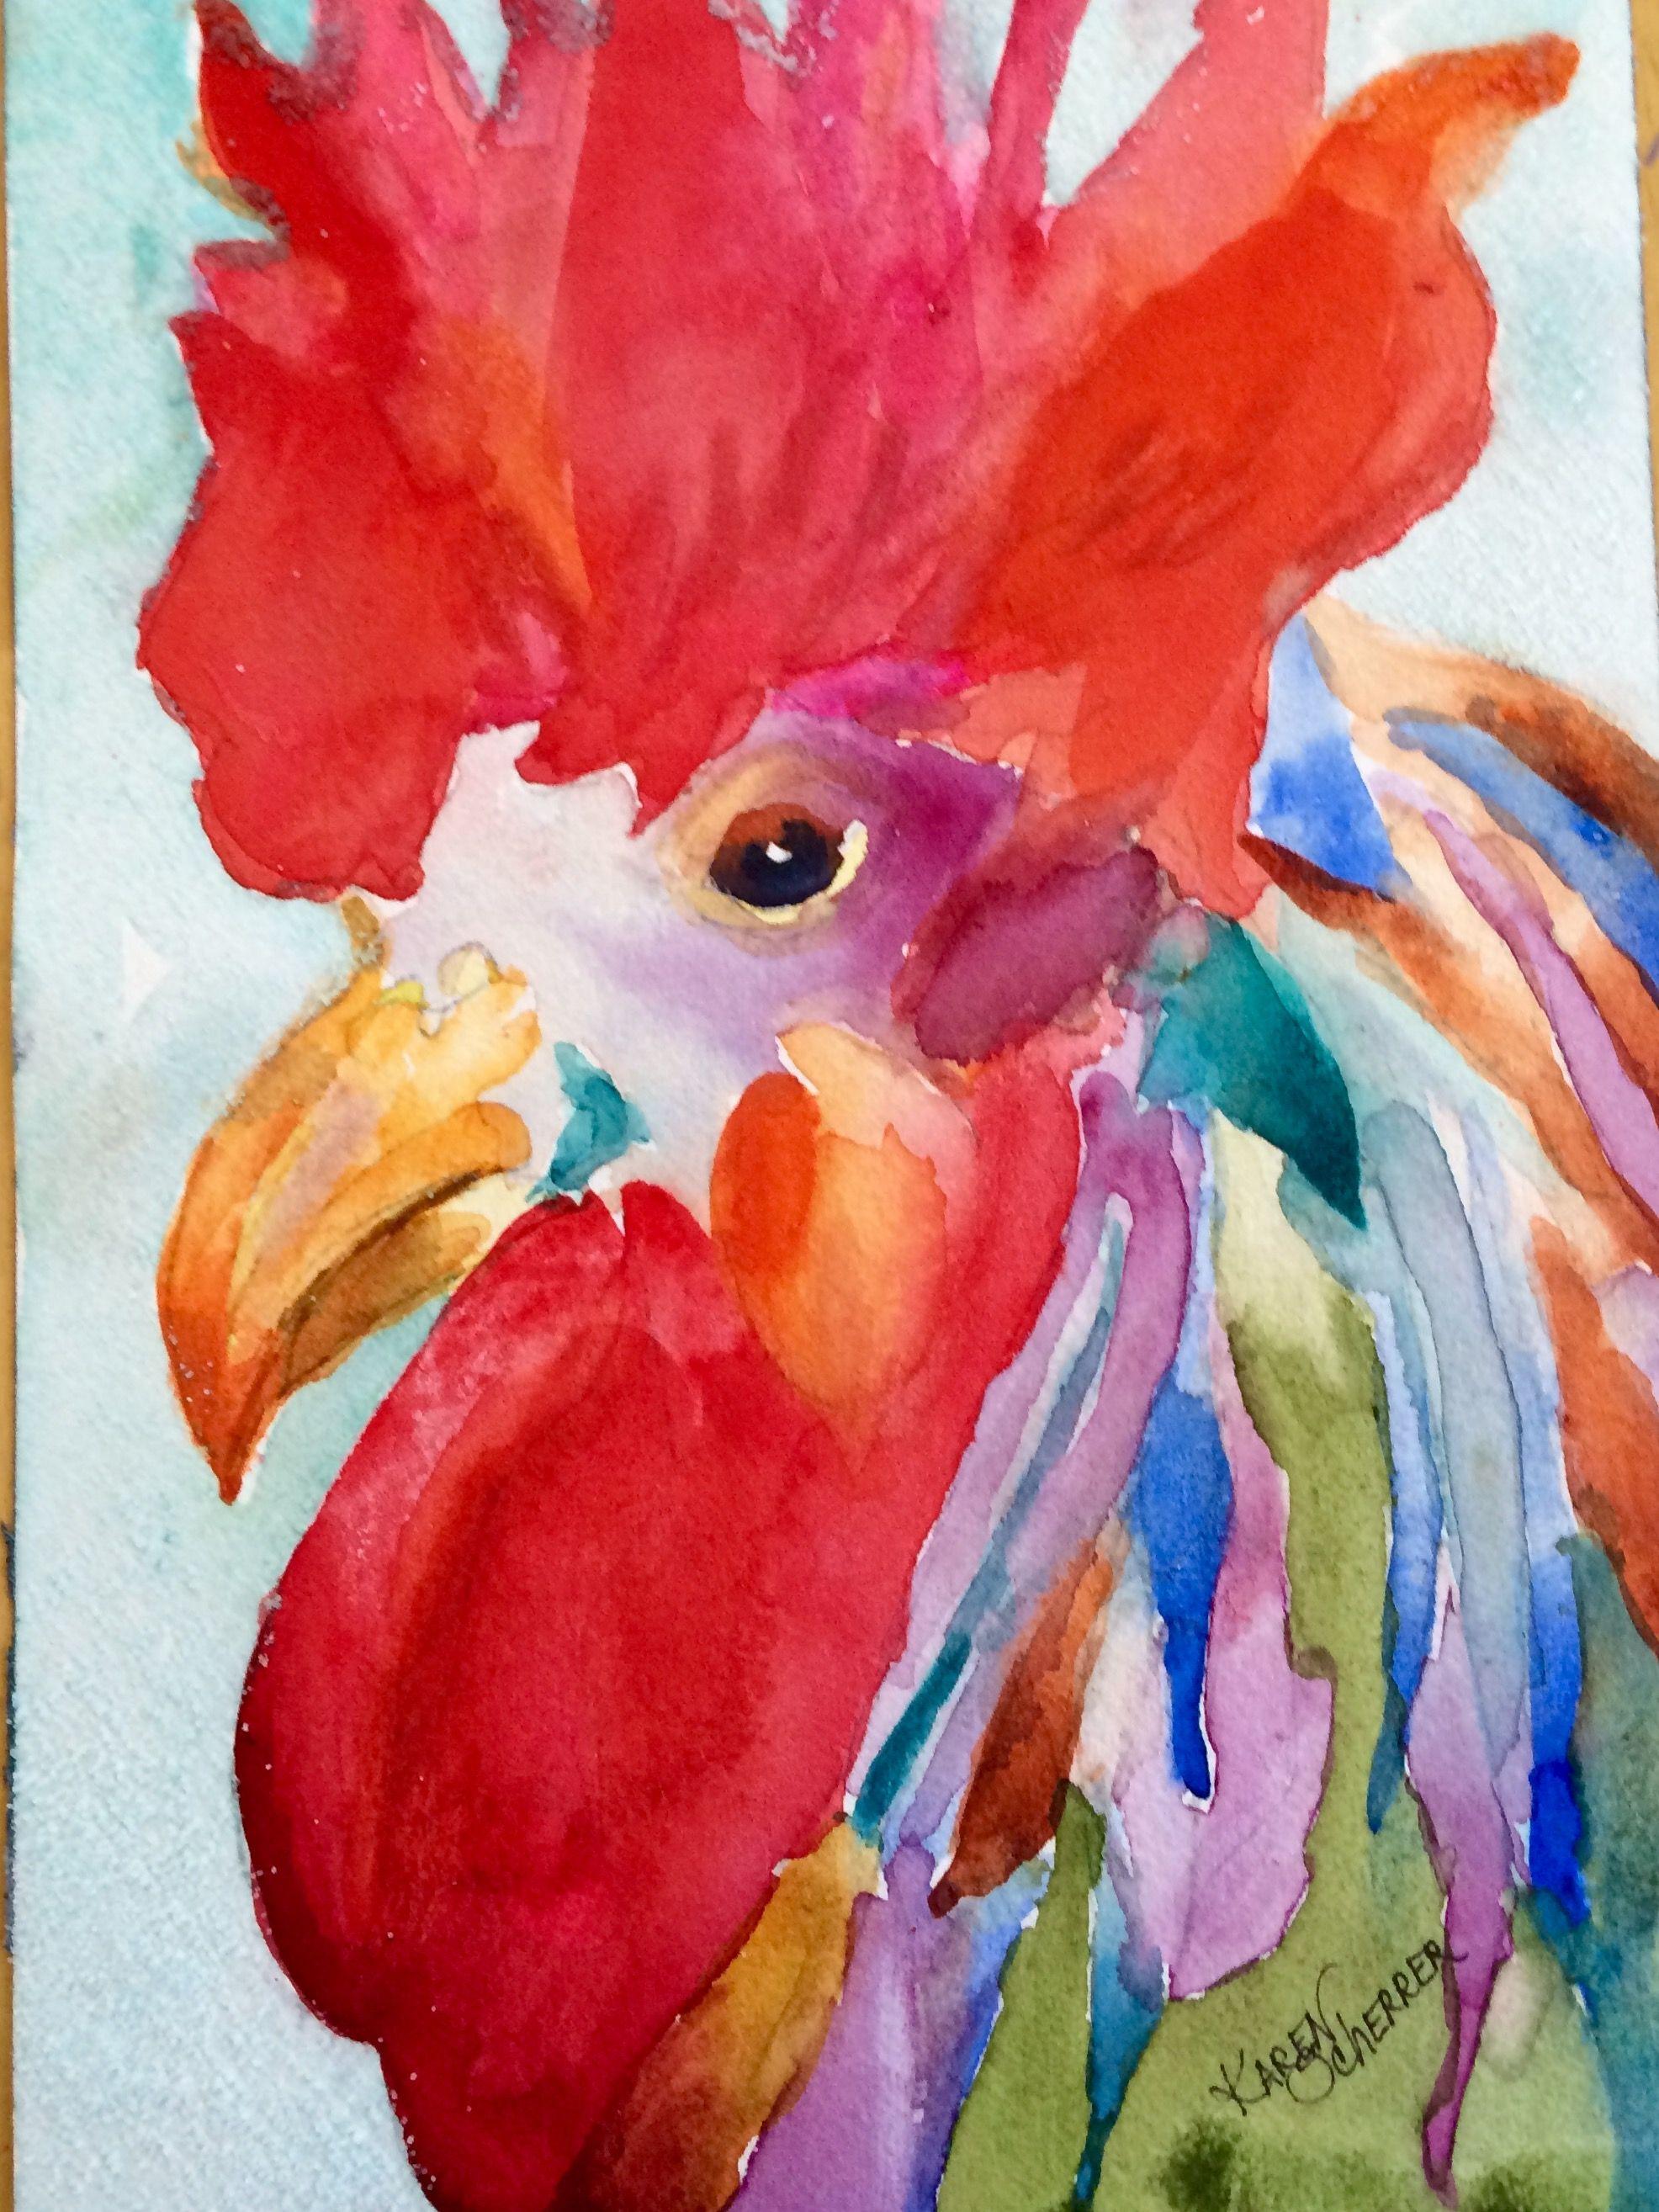 Watercolor artists in texas -  Something To Crow About By Texas Watercolor Artist Karen Scherrer